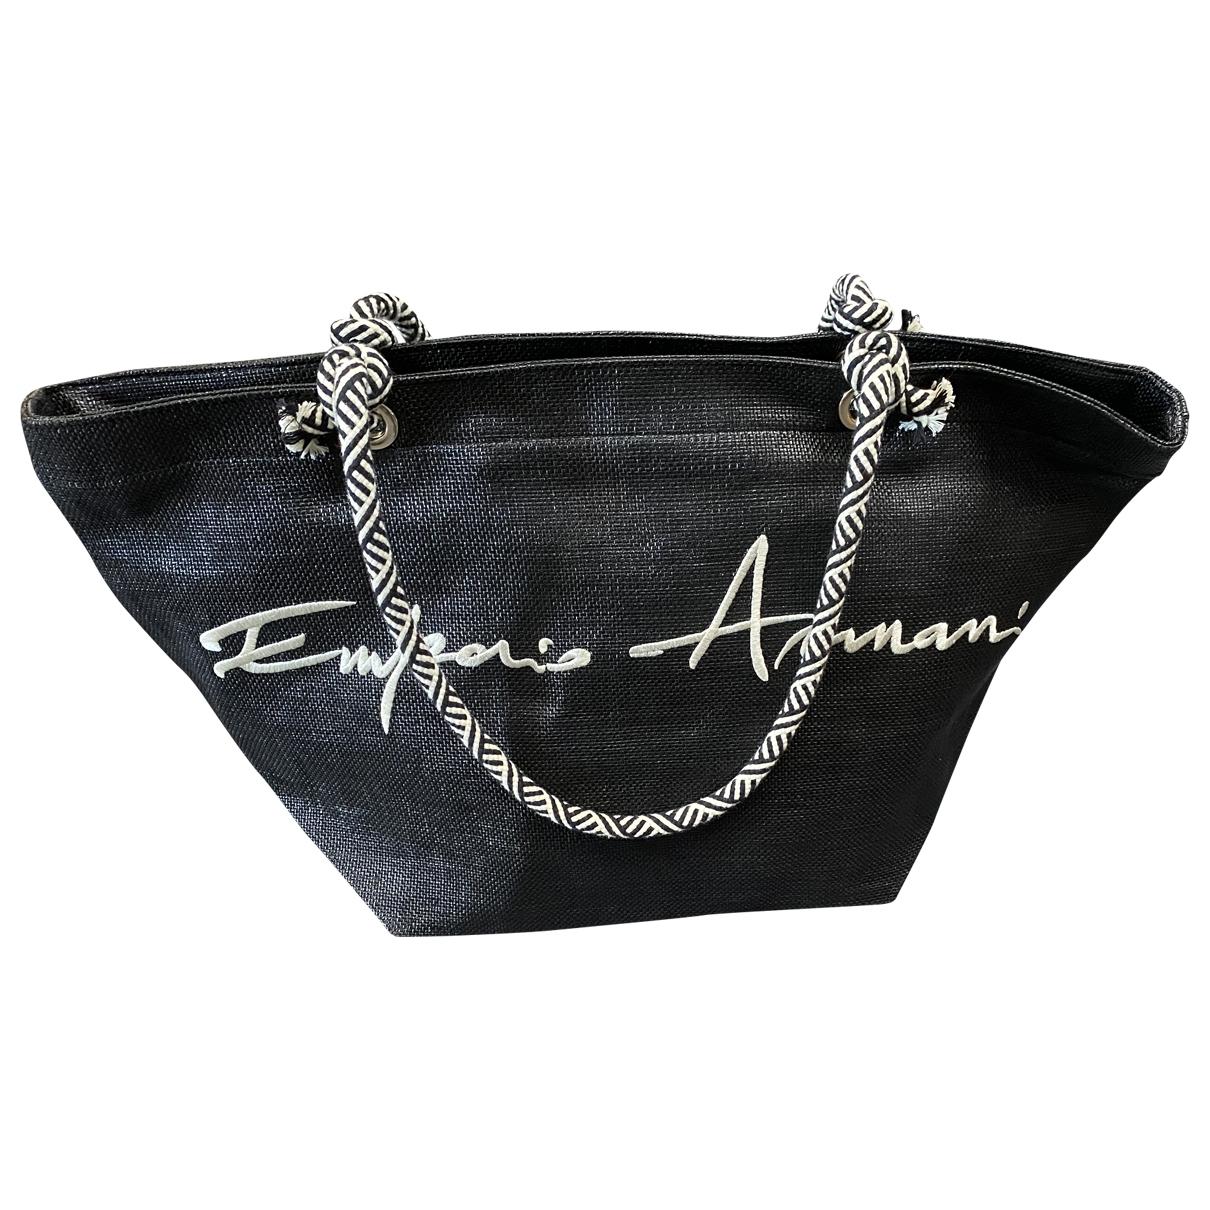 Emporio Armani - Sac a main   pour femme - noir